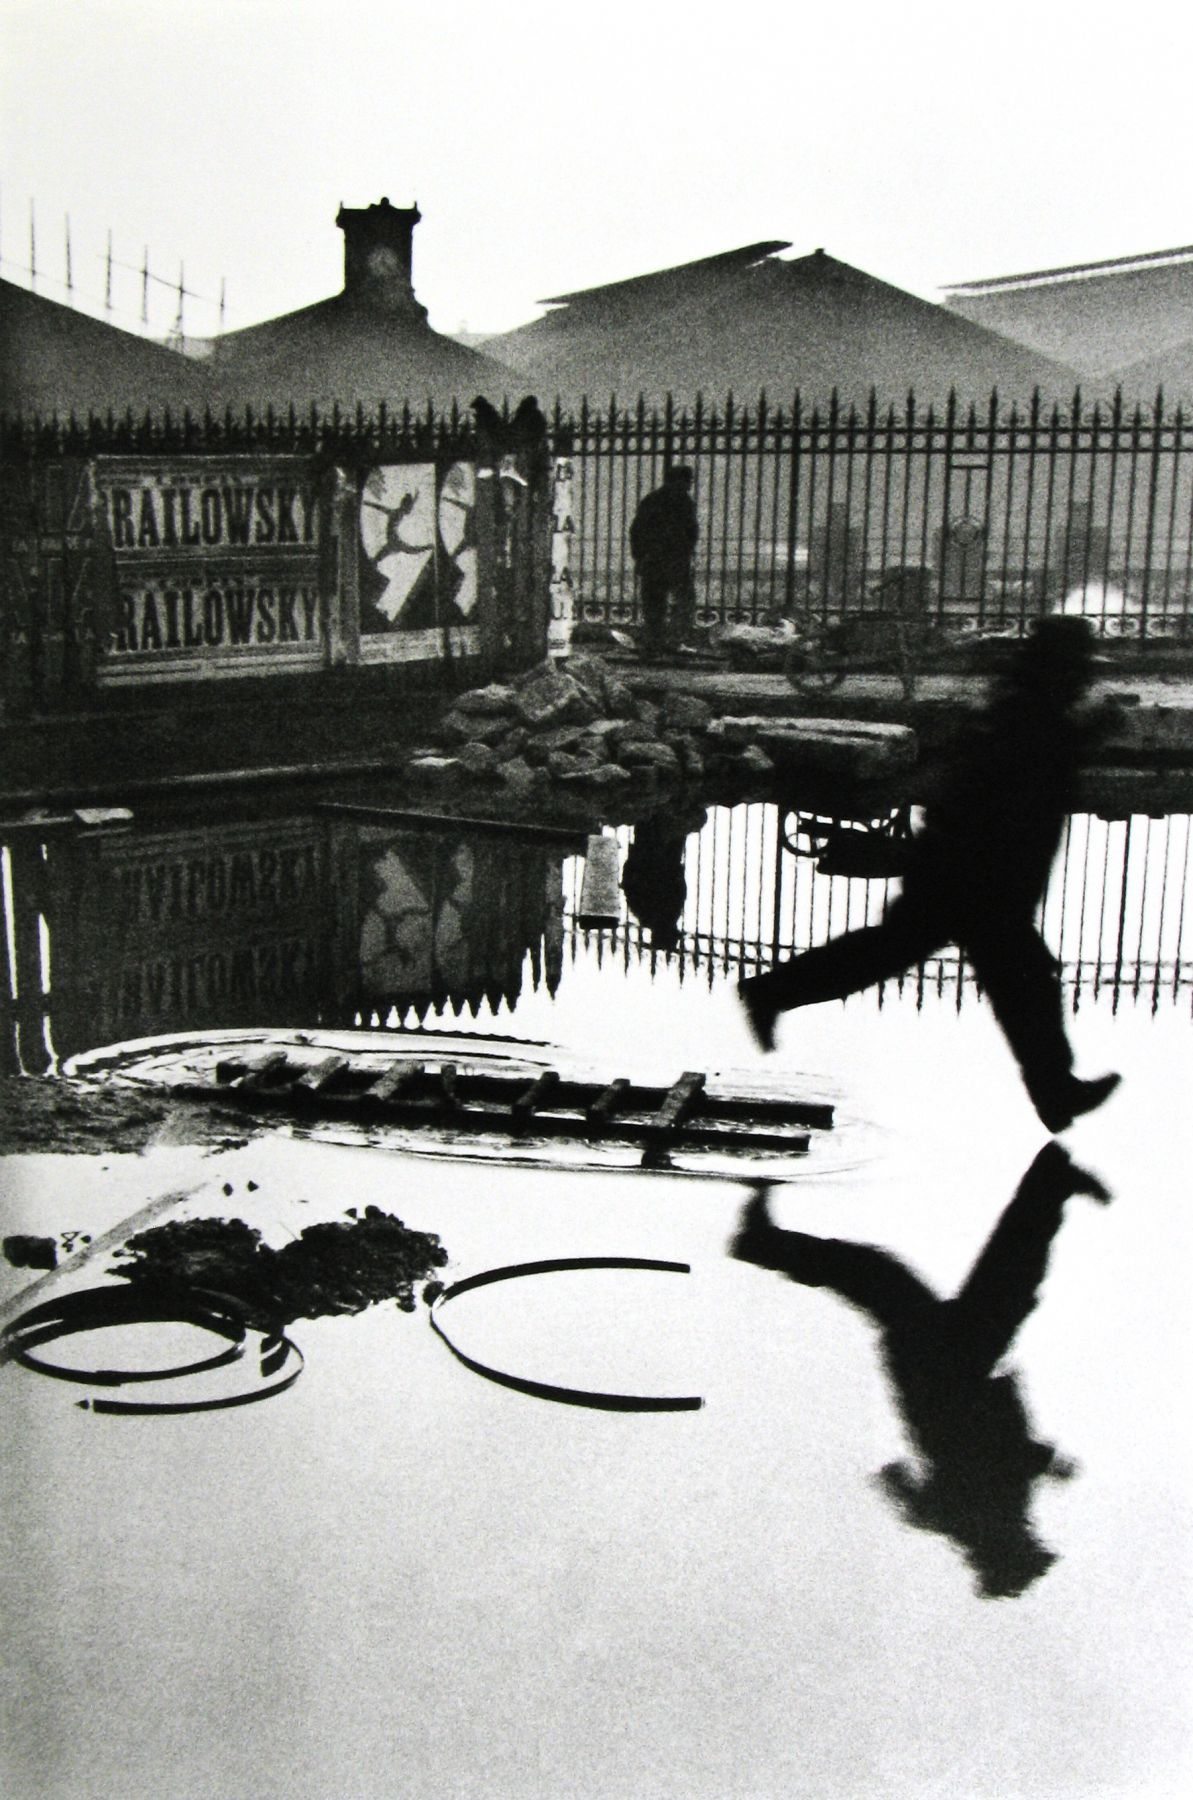 Henri Cartier-Bresson, Howard Greenberg Gallery, 2017